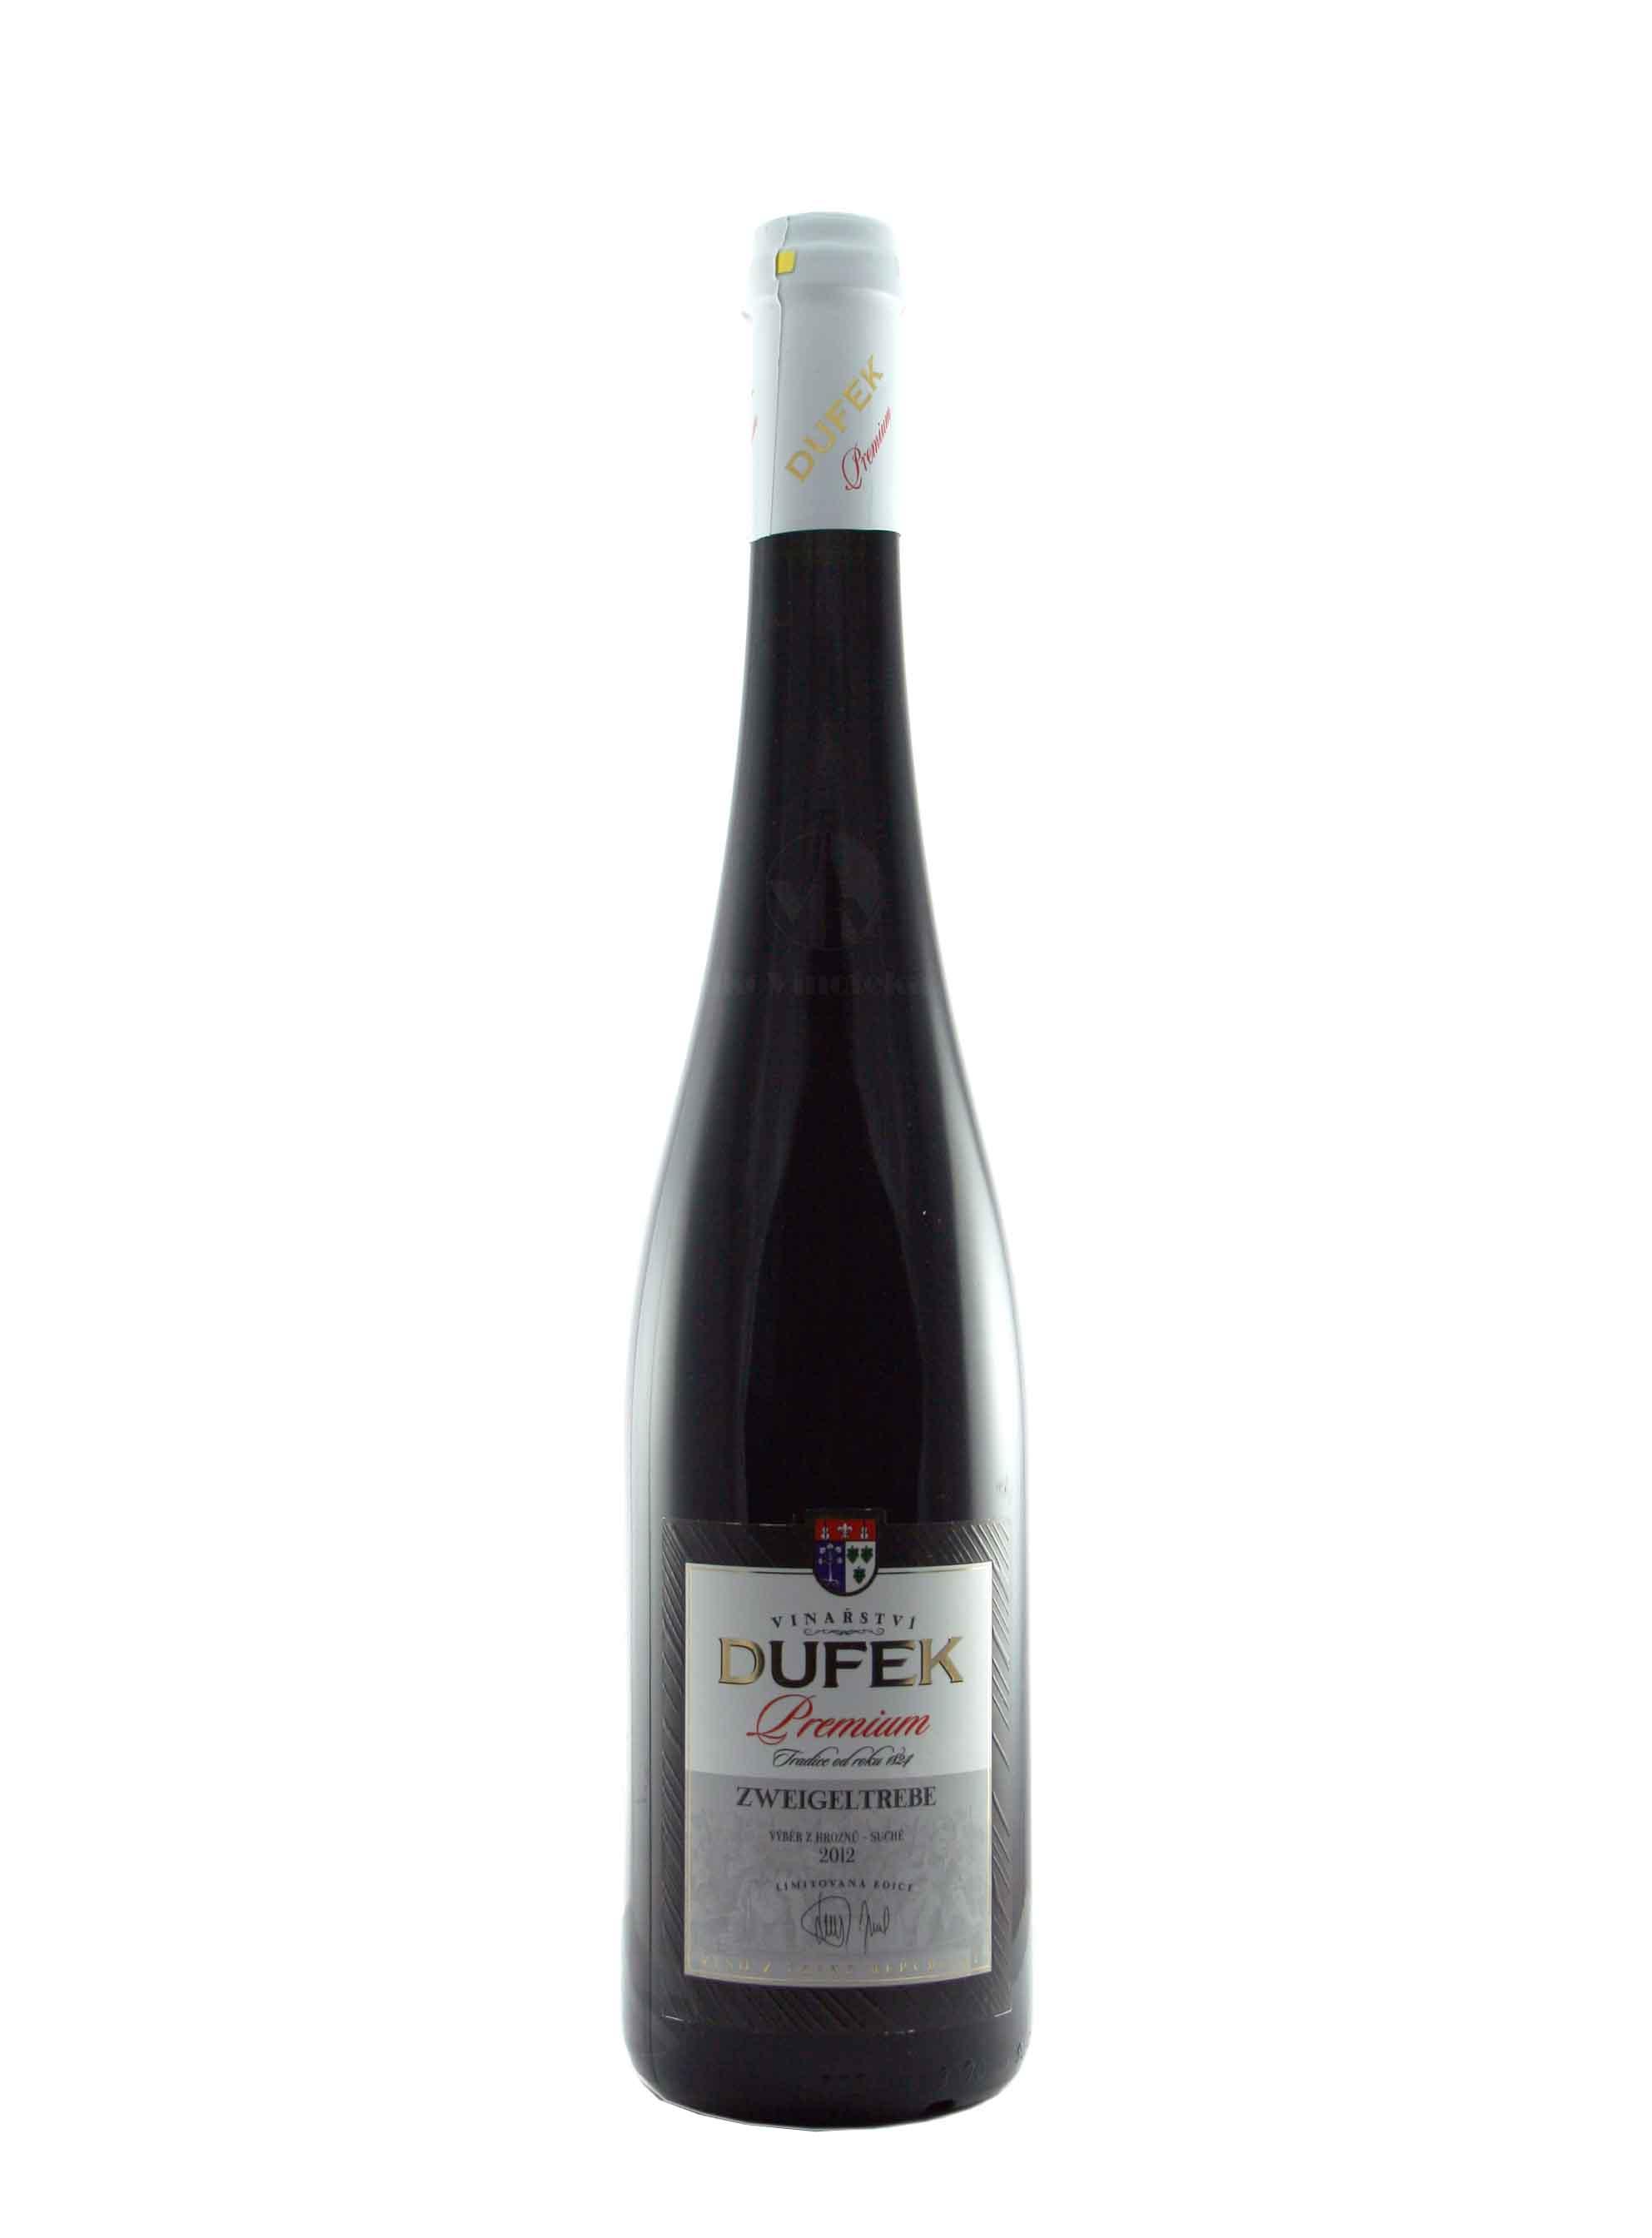 Zweigeltrebe, Premium, Výběr z hroznů, 2012, Vinařství Dufek, 0.75 l